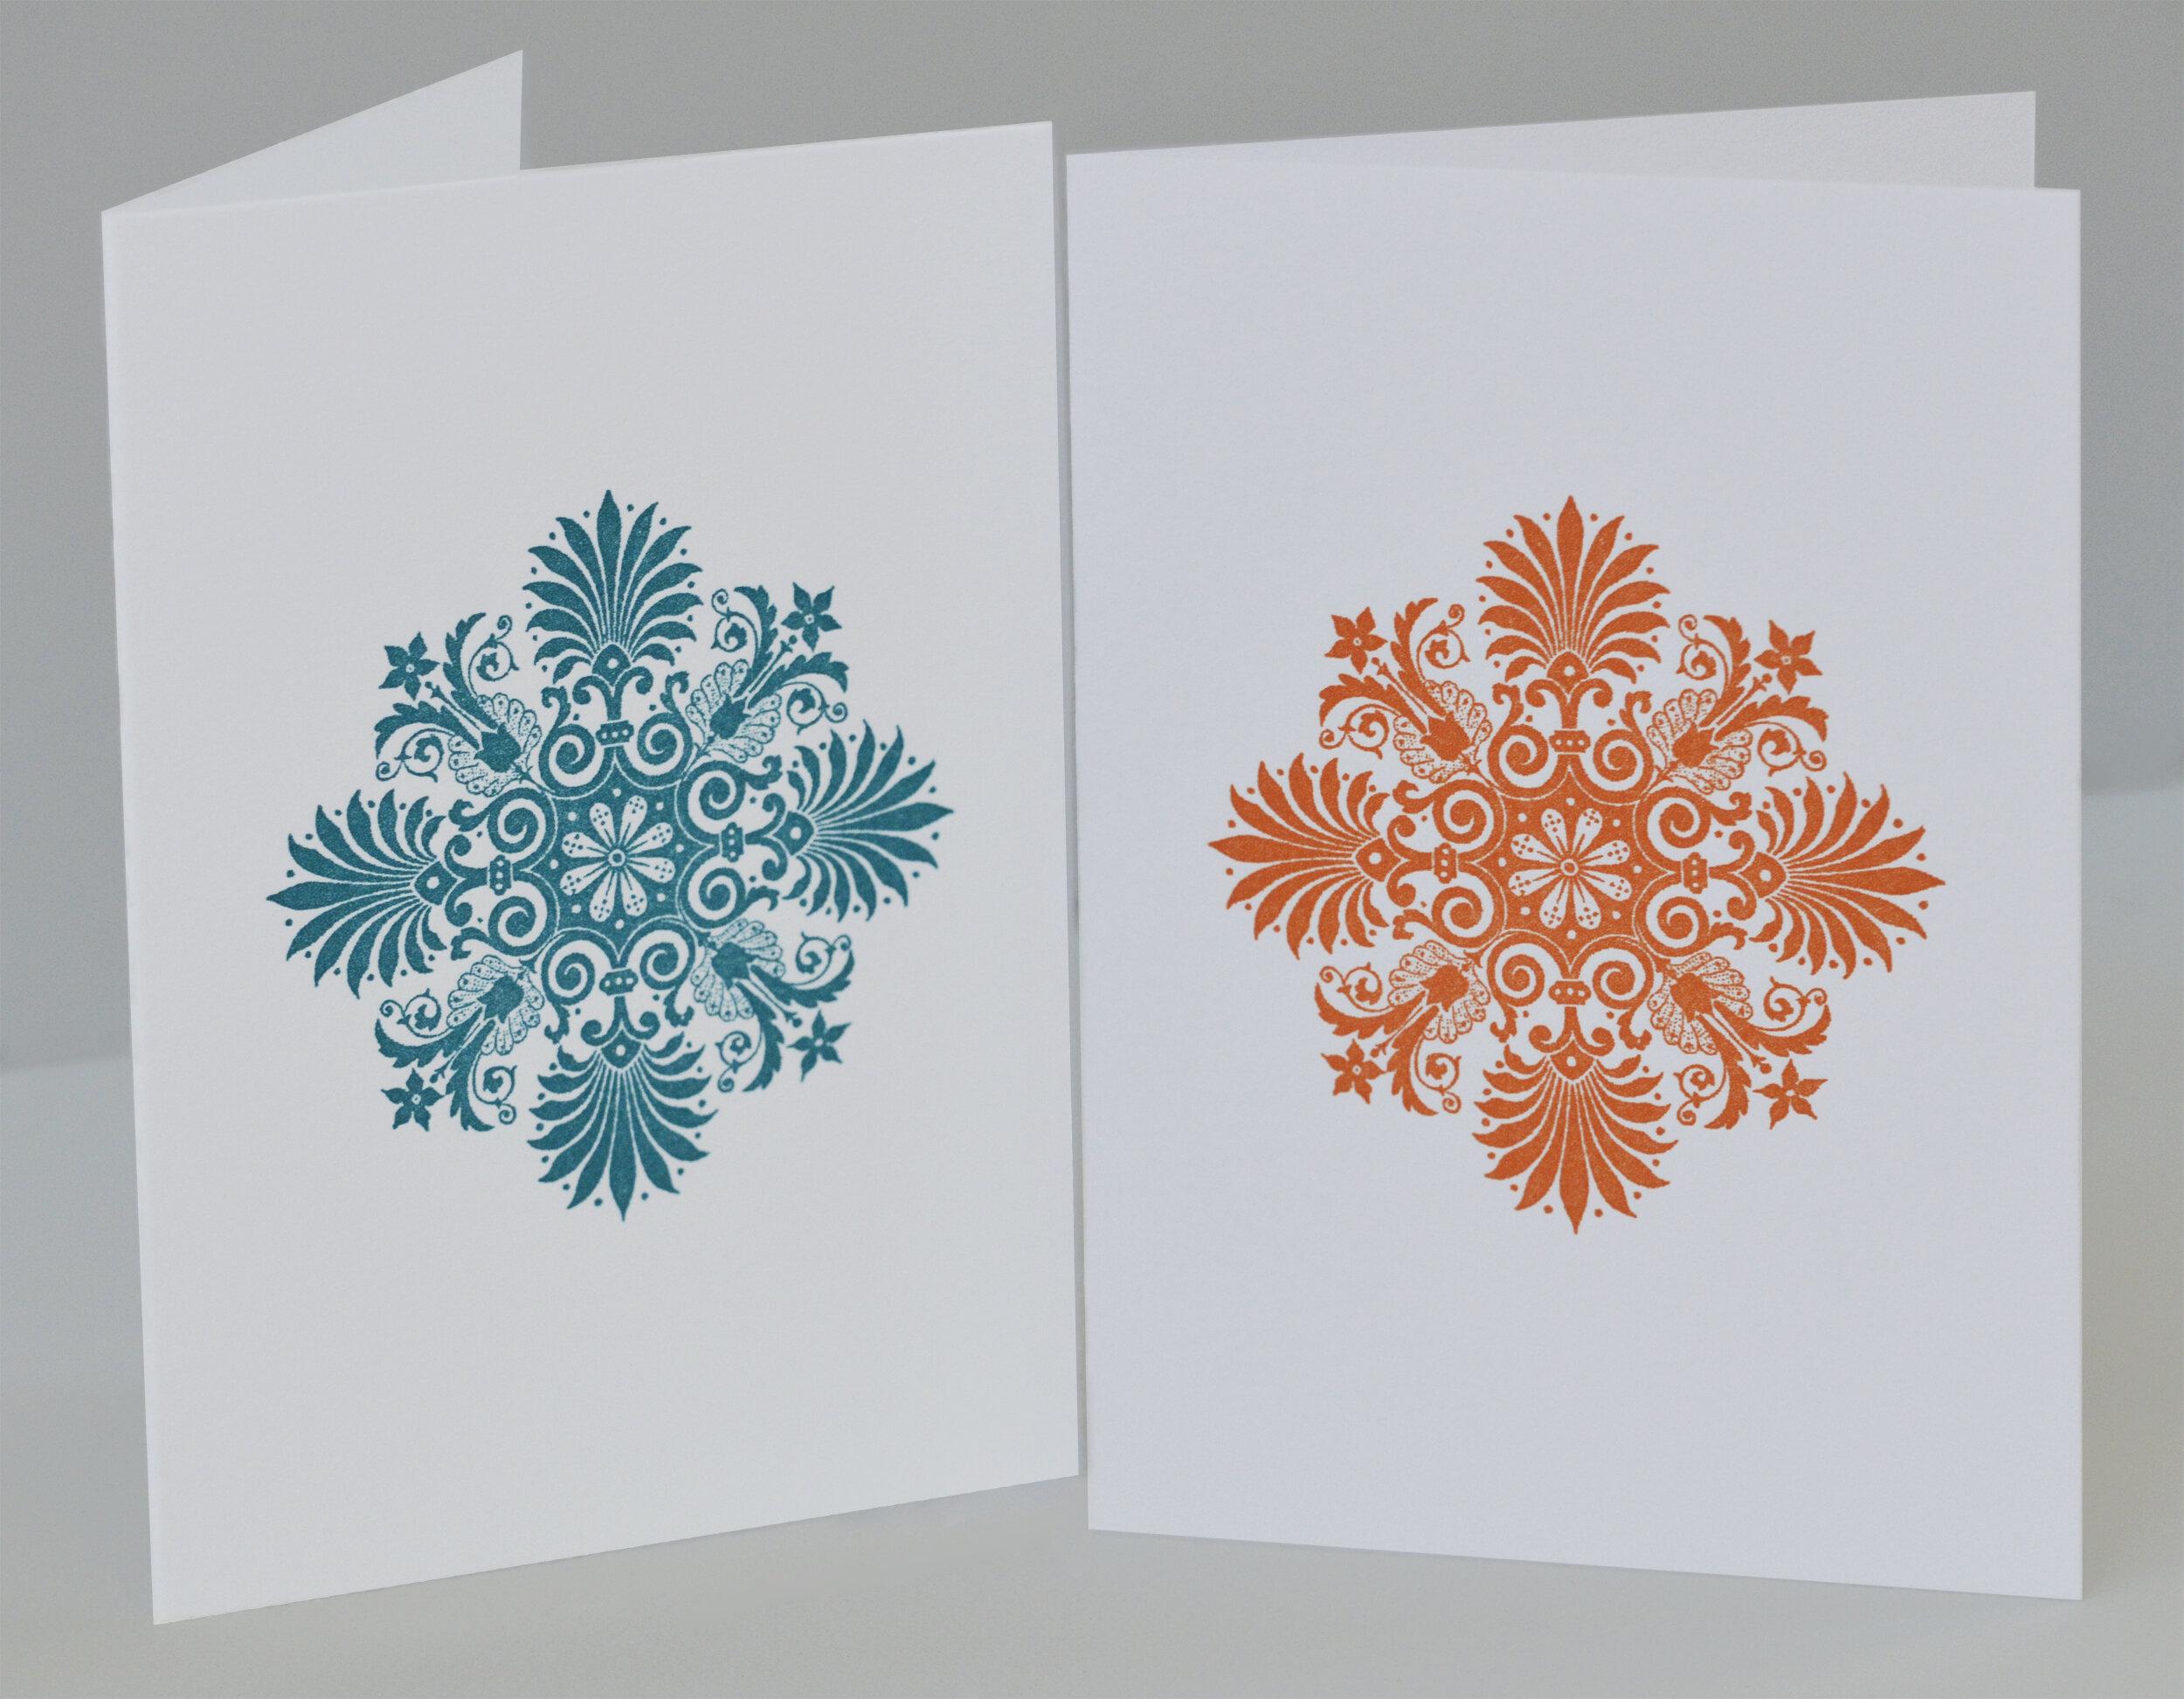 cclifford_ornaments (together).jpg